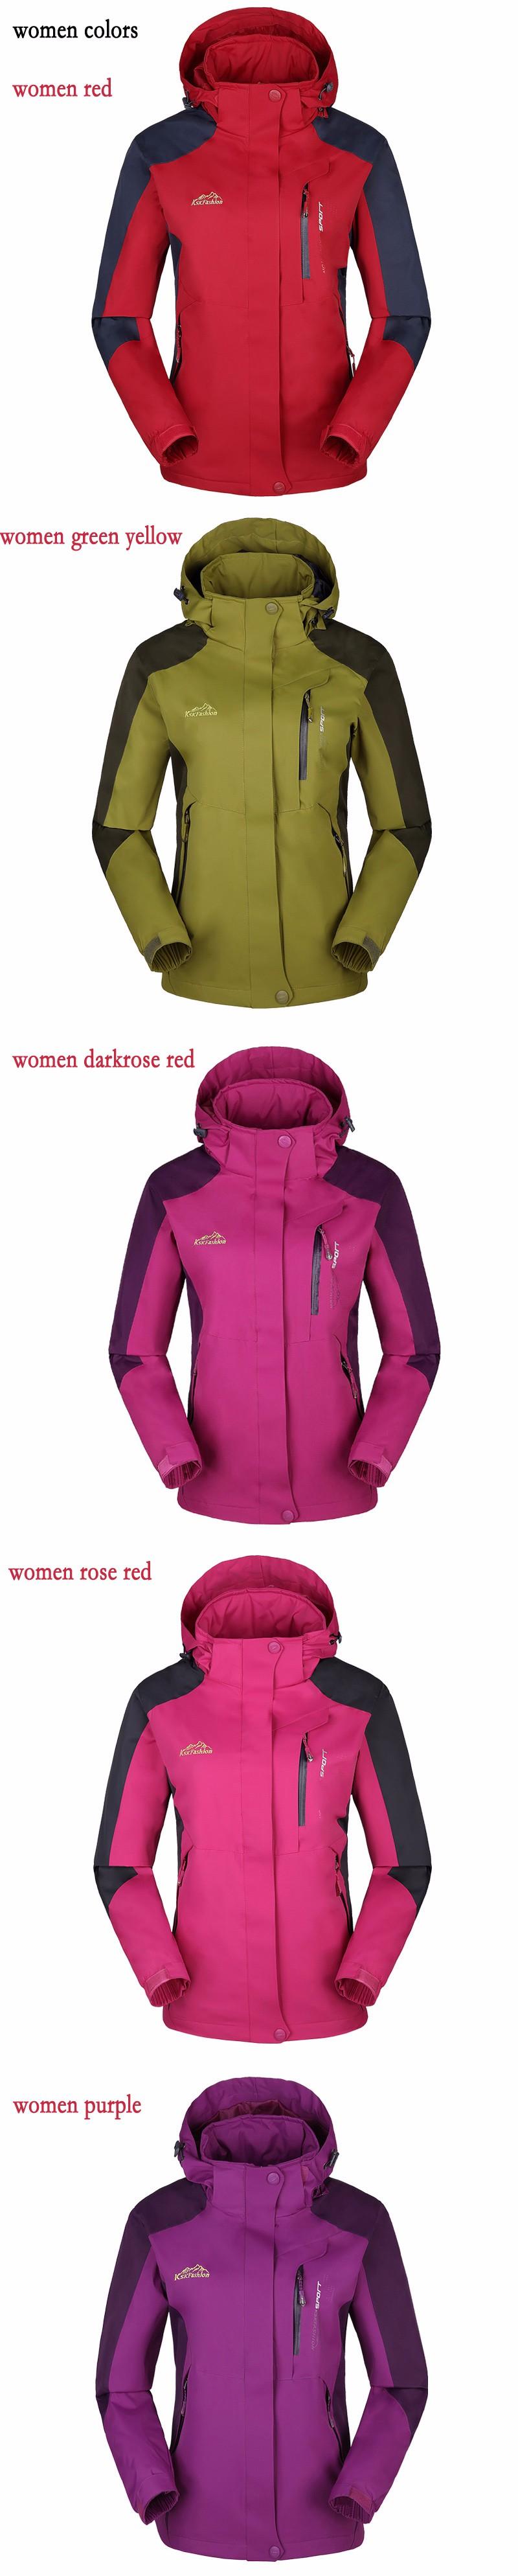 men women jacket (5)